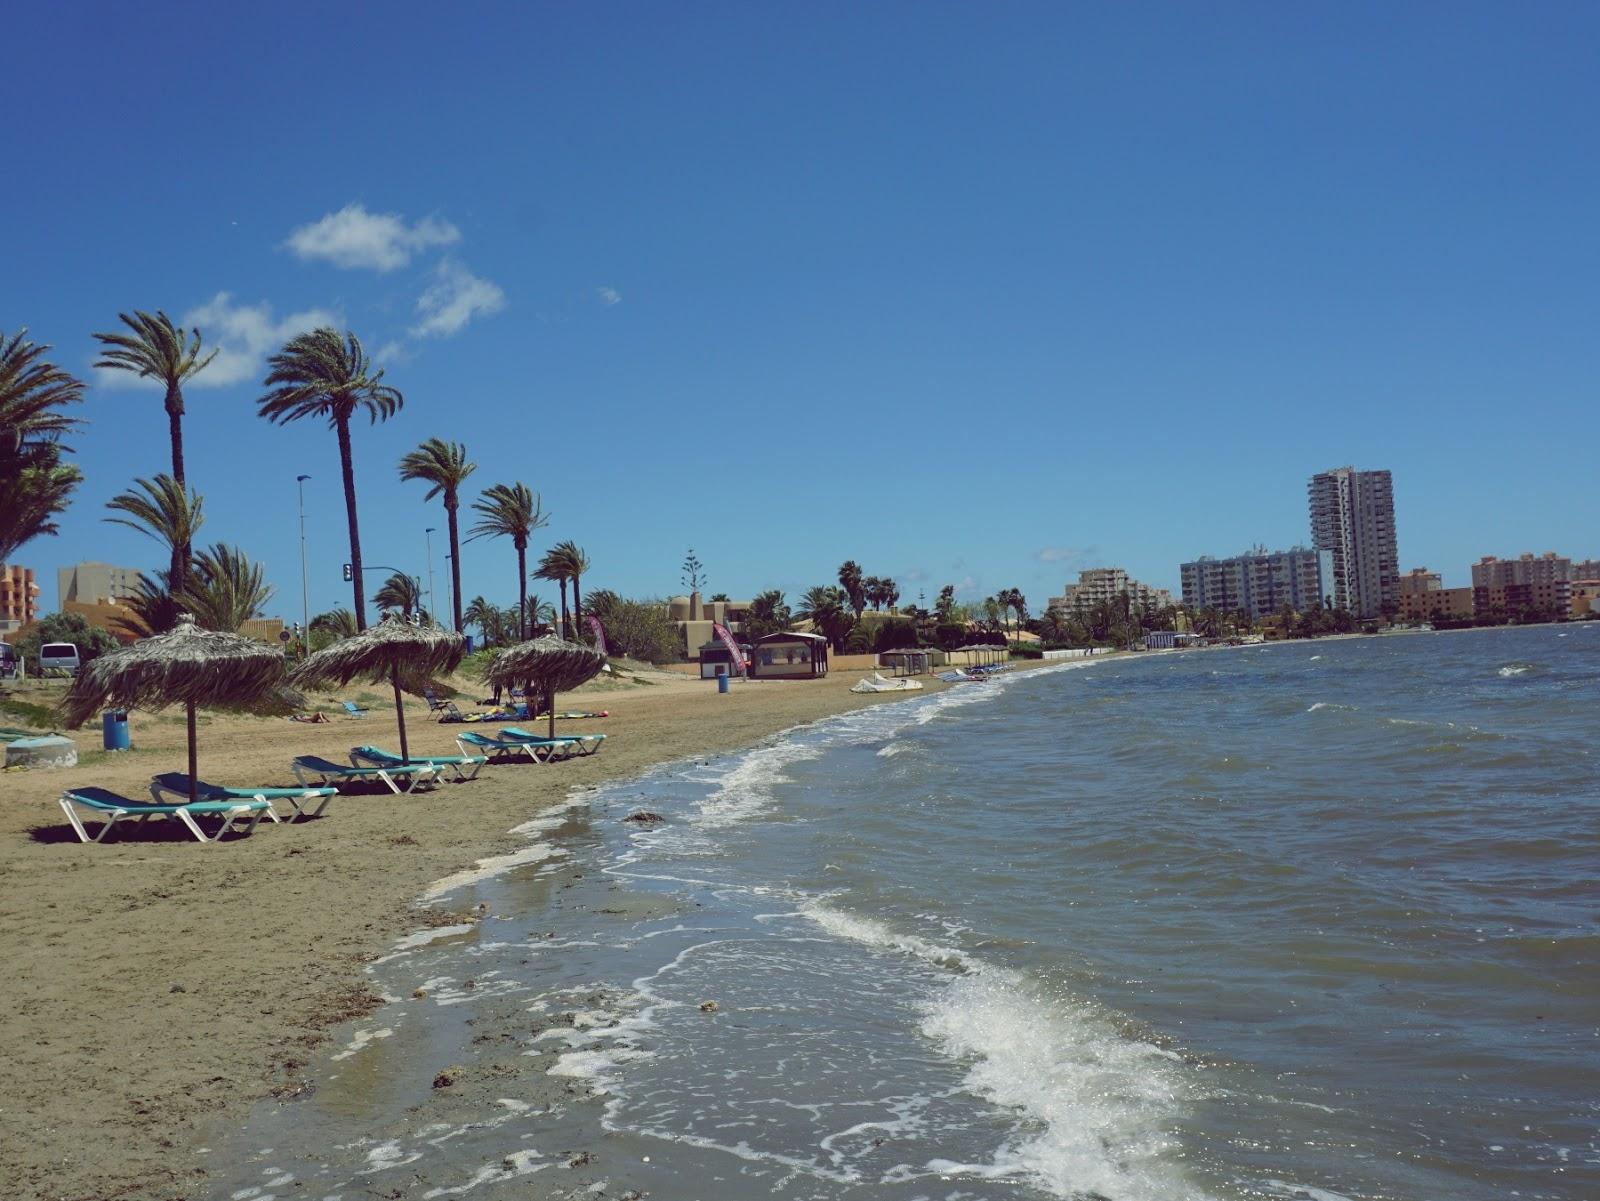 Pani Dorcia, panidorcia blog, blog o Islandii, blog o Hiszpanii, wakacje w Hiszpanii, urlop w Hiszpanii, La Manga, morze, plaża, La Mar Menor